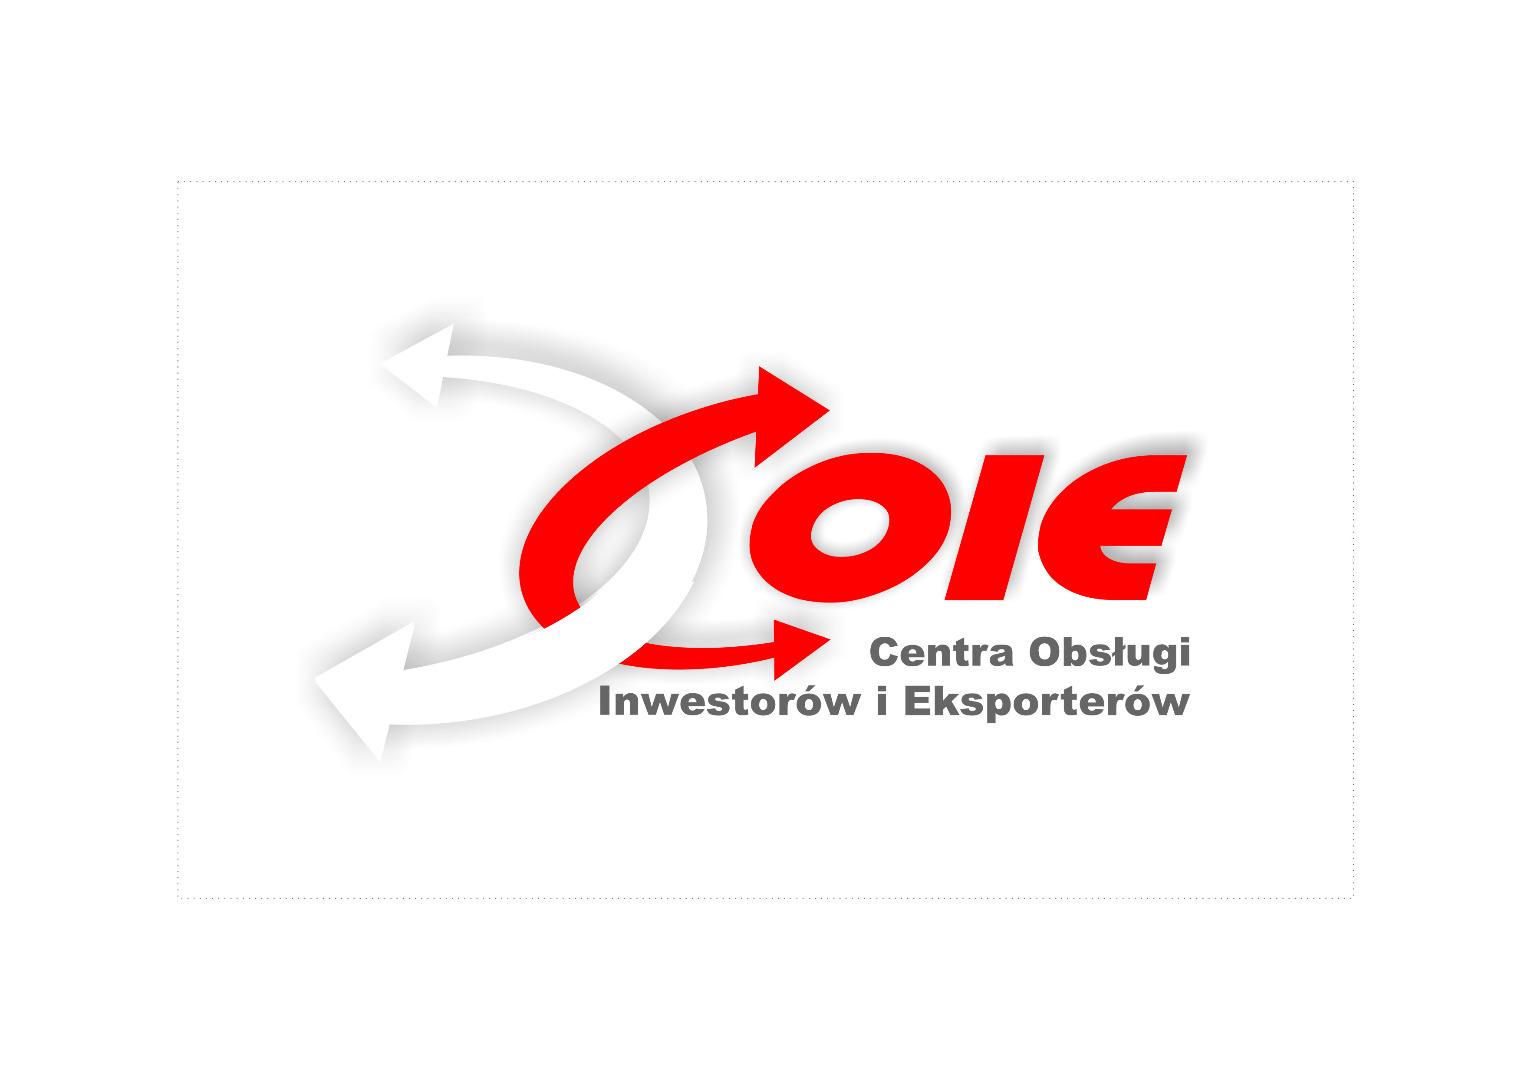 logotyp COIE jpg